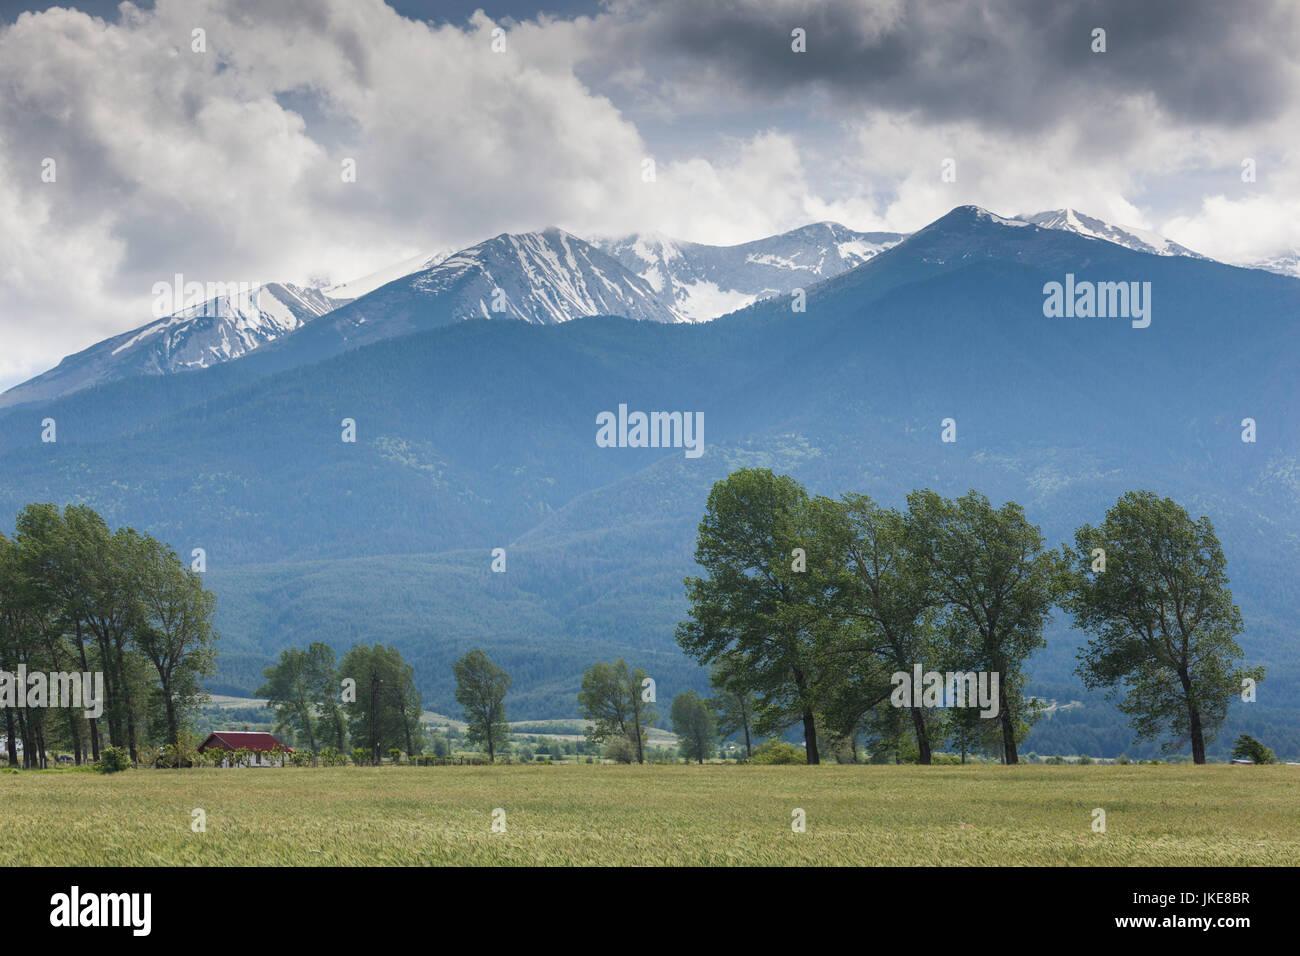 La Bulgaria, montagne meridionali, Bansko, ski resort, paesaggio con montagne Pirin Immagini Stock